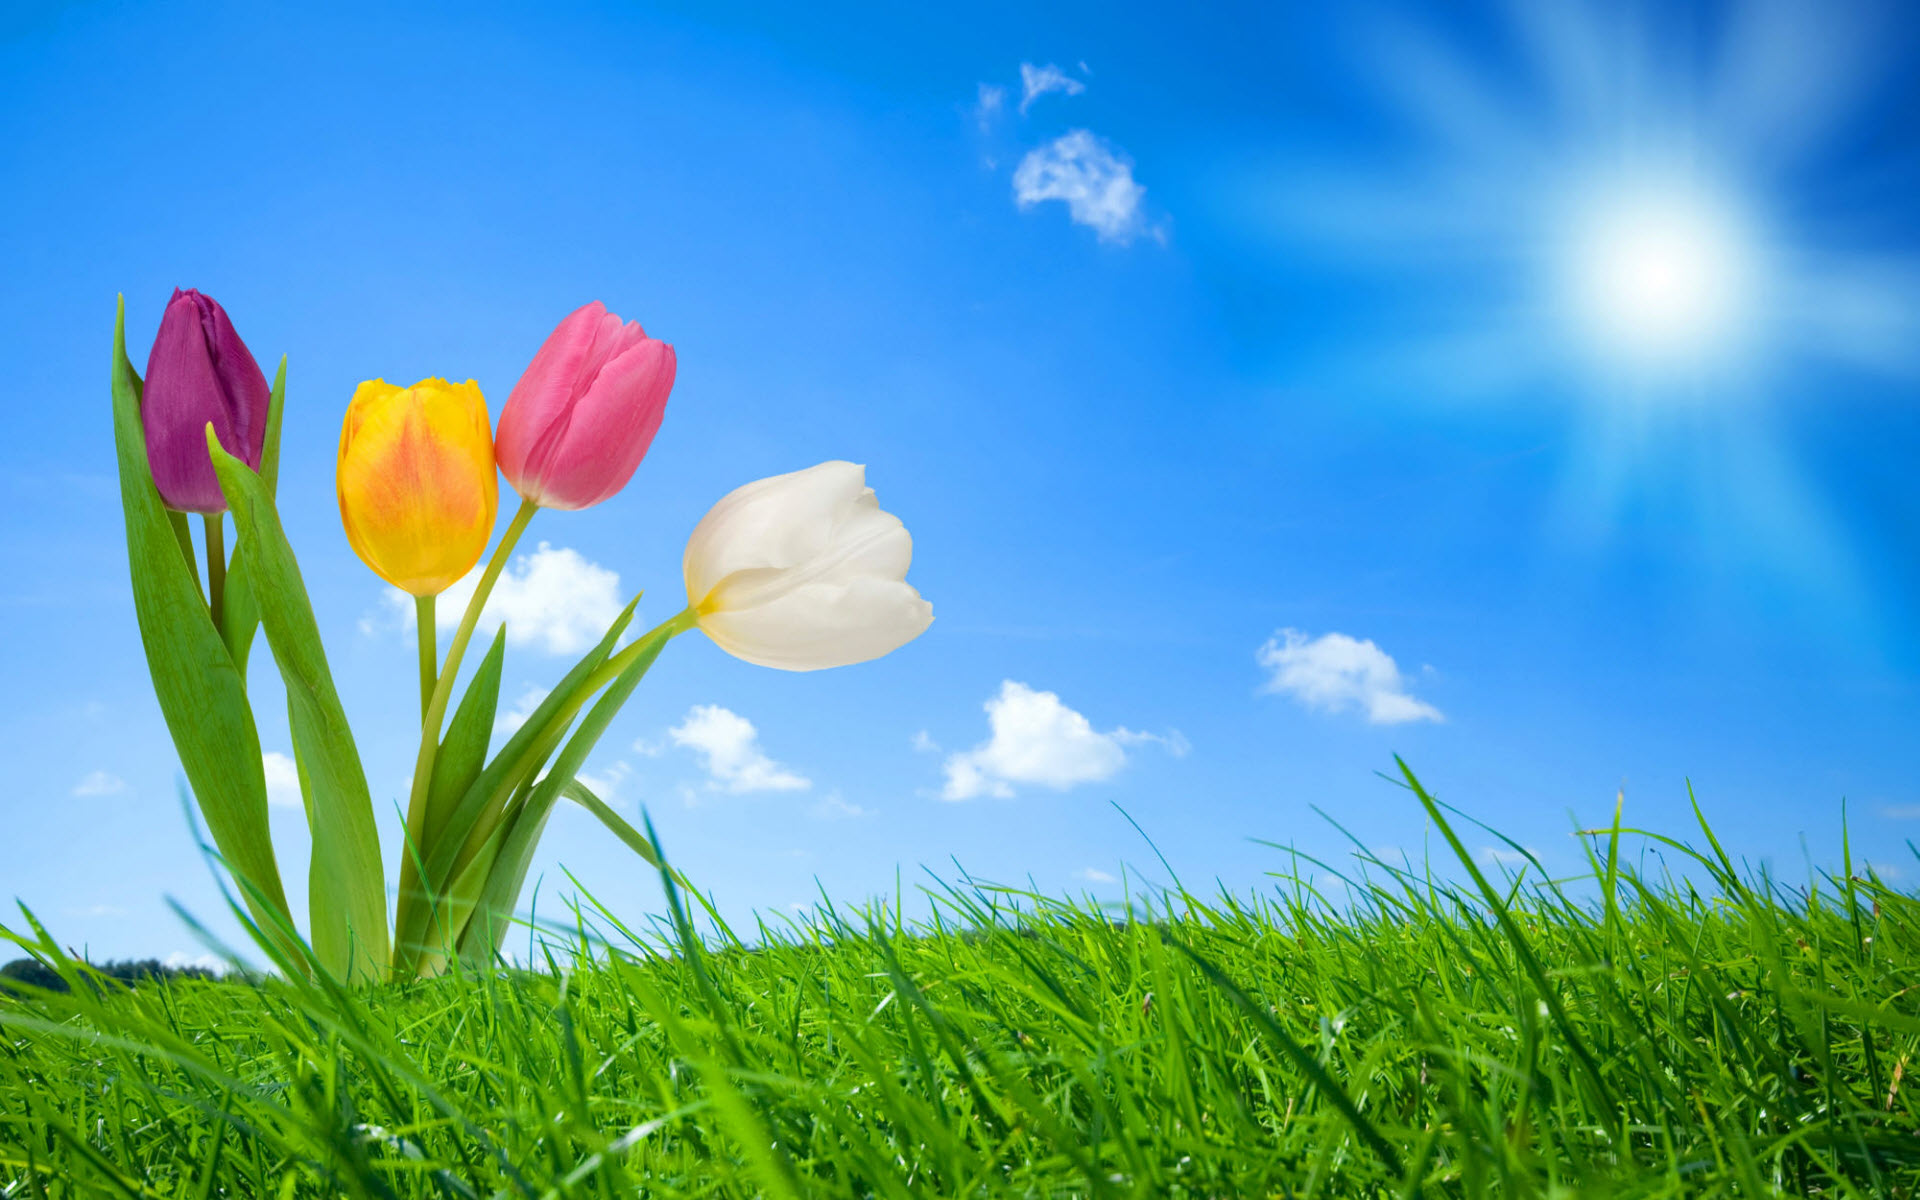 Chic Spring Around - Chic Spring Around